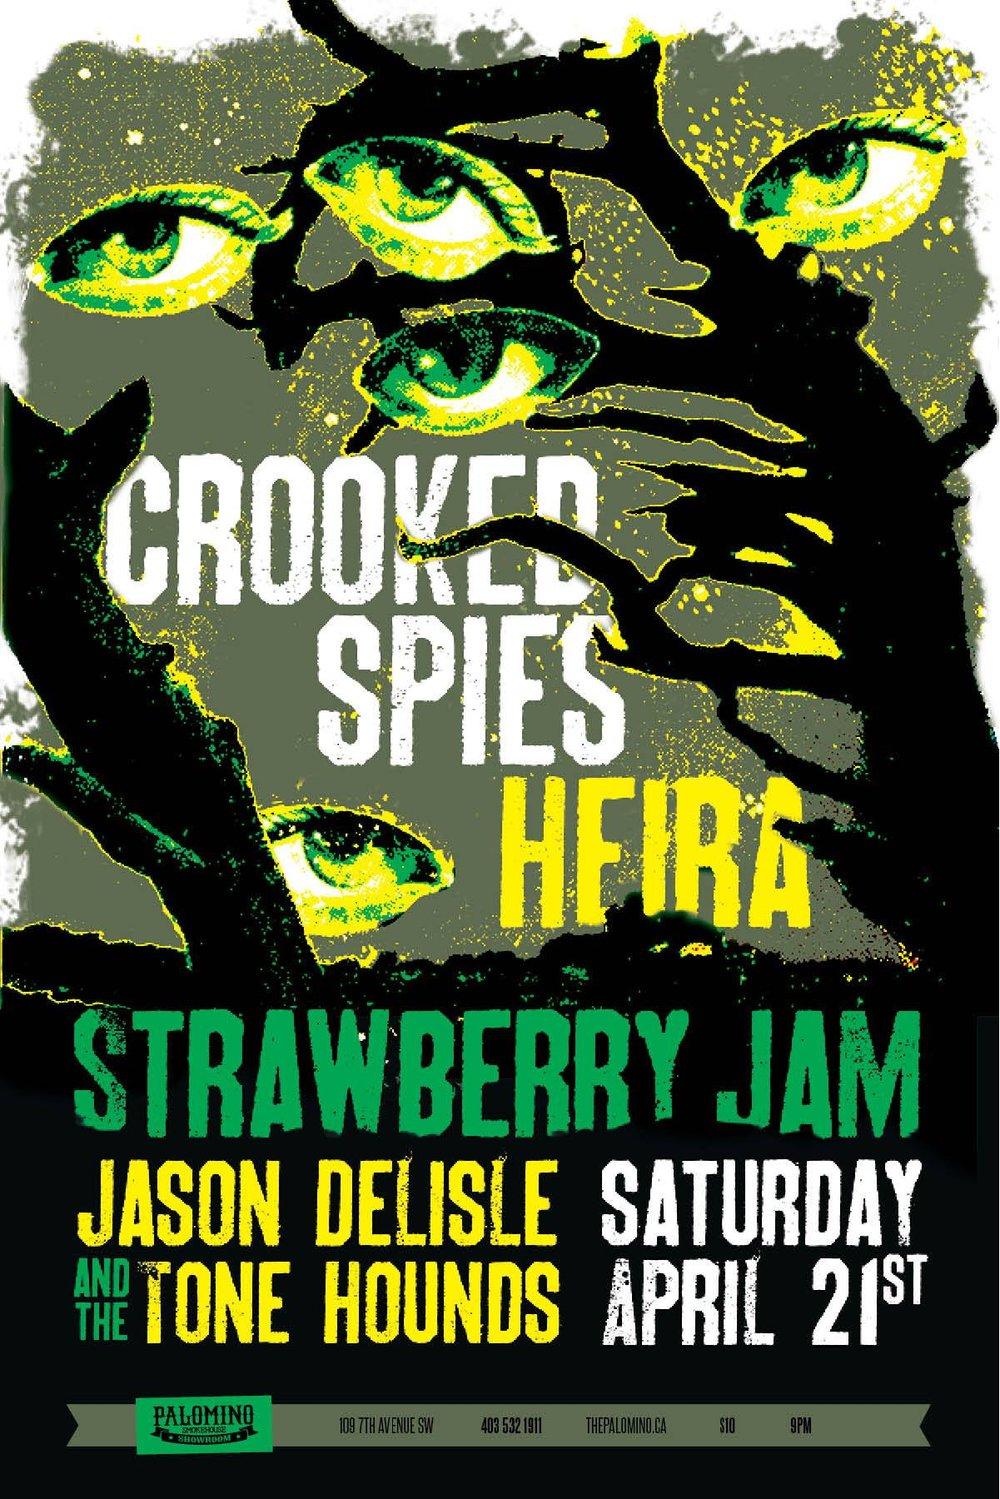 Saturday, April 21 @ Palomino Smokehouse w/ Heira, Strawberry Jam & Jason Delisle and the Tone Hounds -